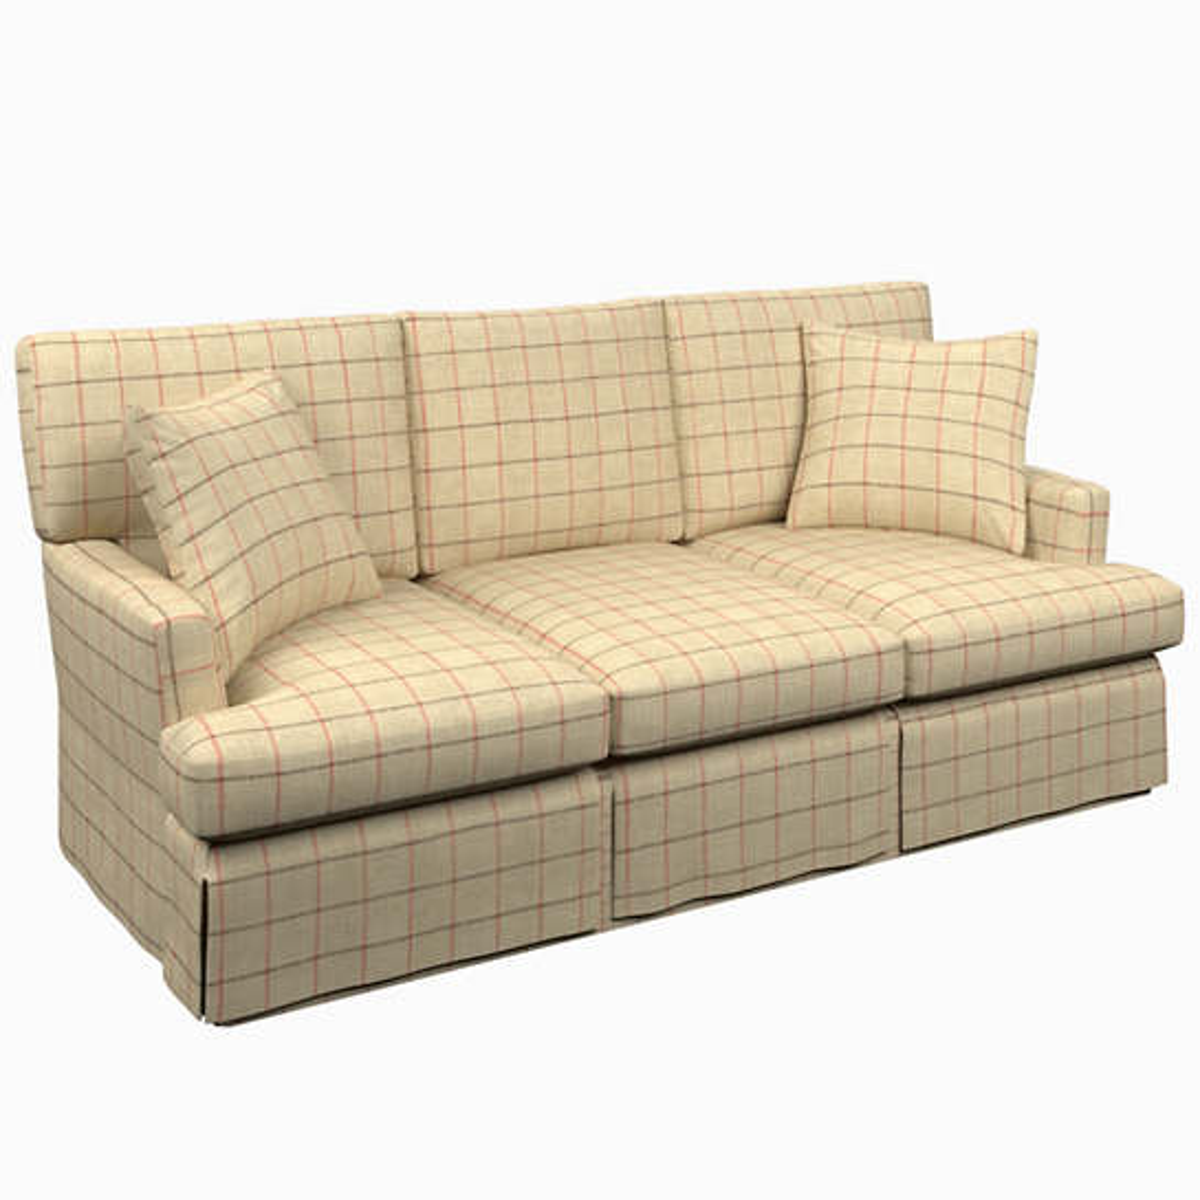 Chatham Tattersall Brick/Brown Saybrook 3 Seater Sofa